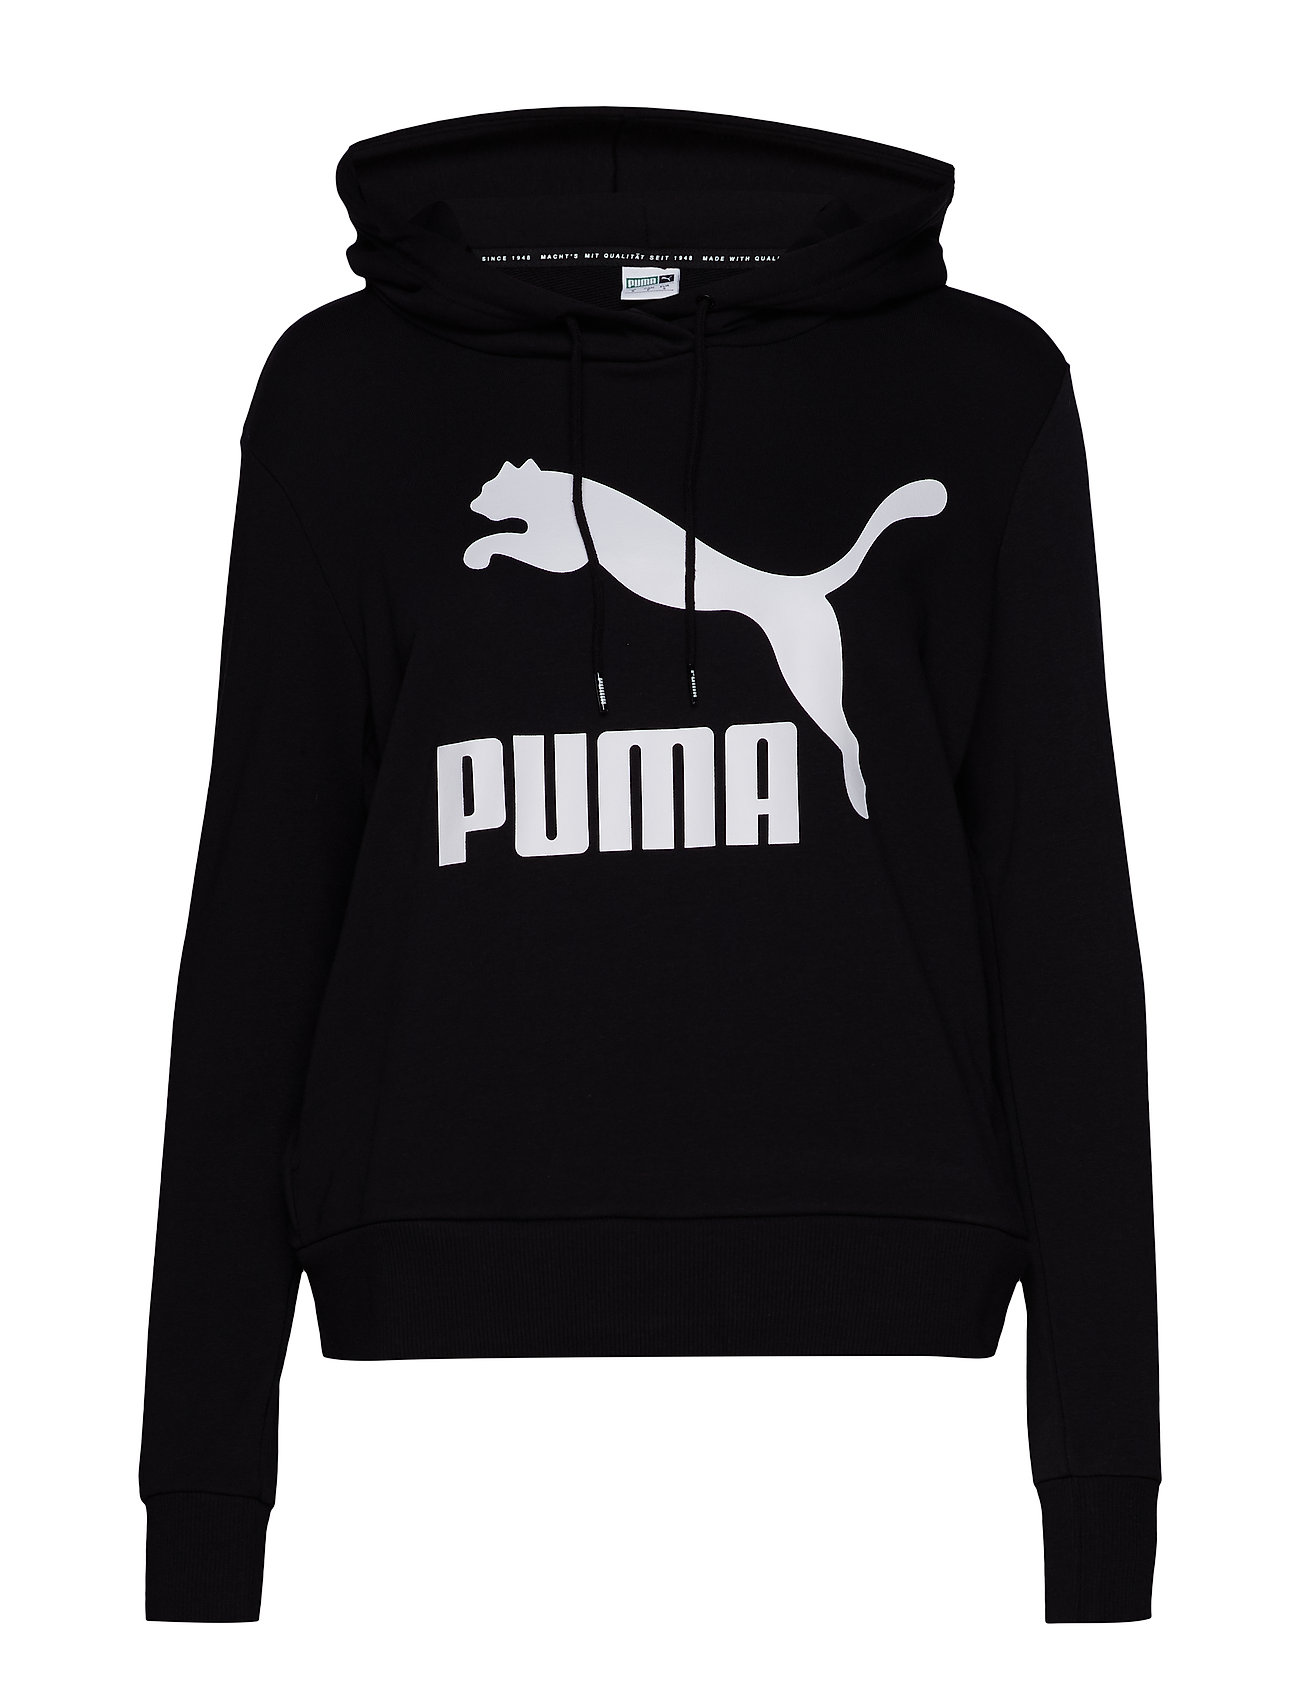 PUMA Classics Logo Hoody - PUMA BLACK